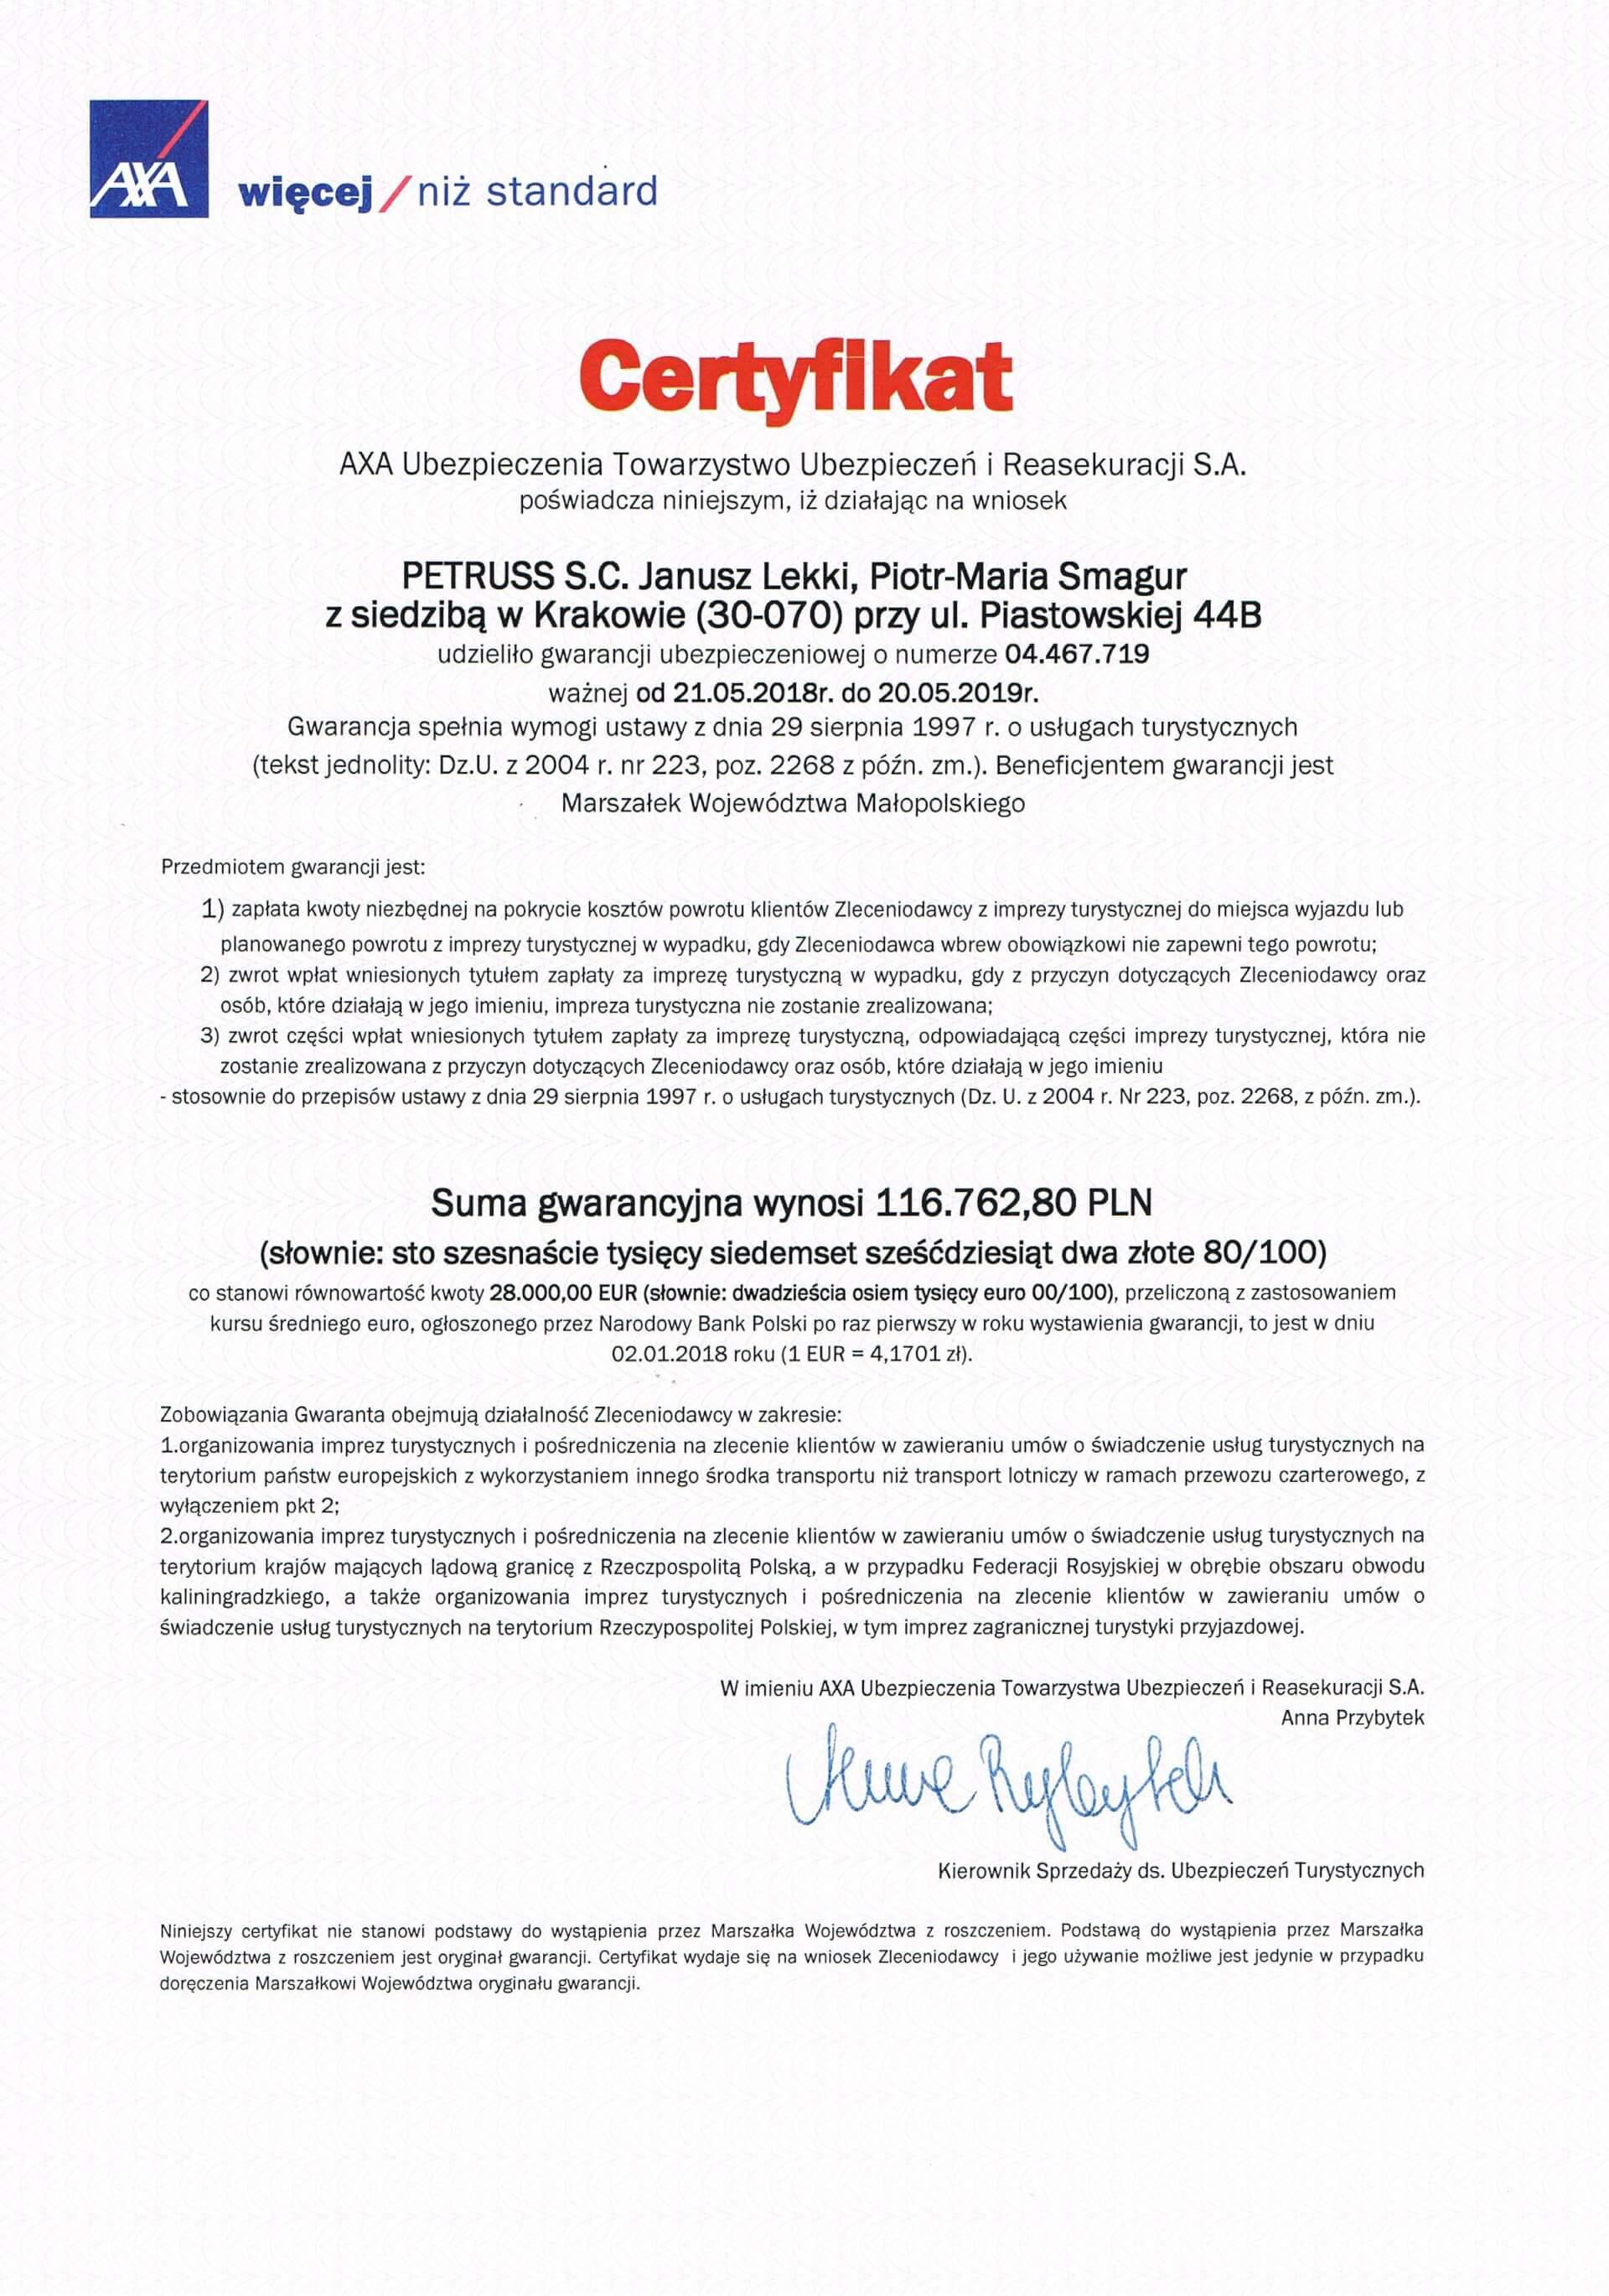 AXA-certyfikat-gwarancji